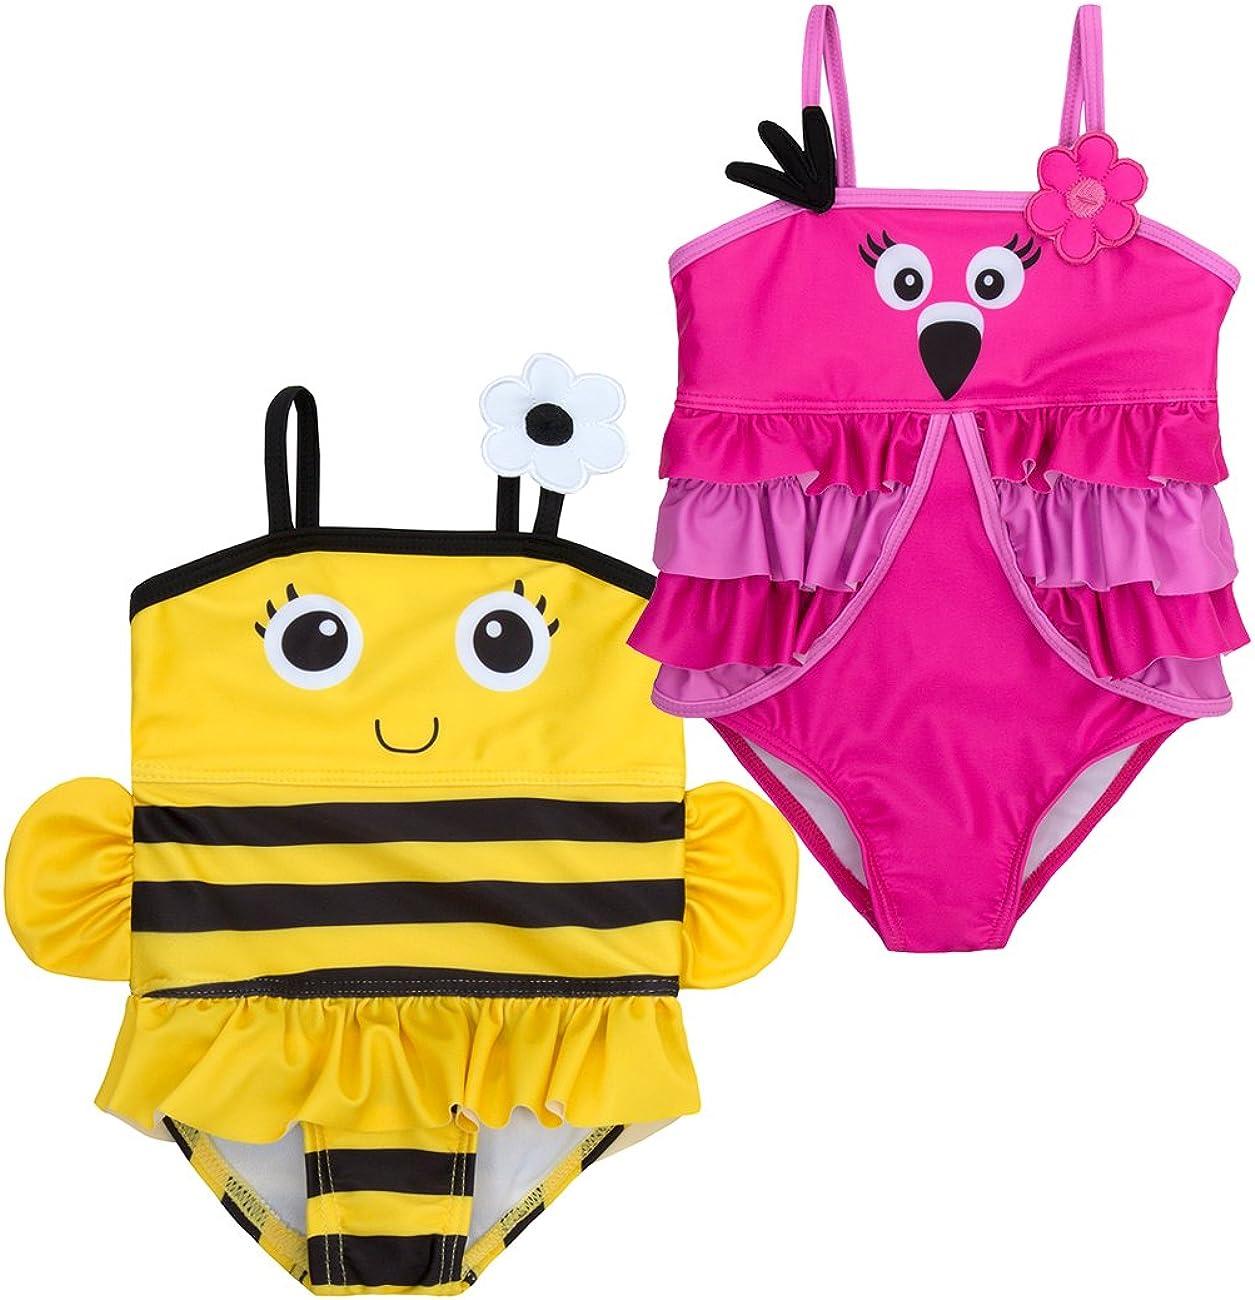 Babytown Infant Baby Girls Novelty Swimming Costume Swimsuit